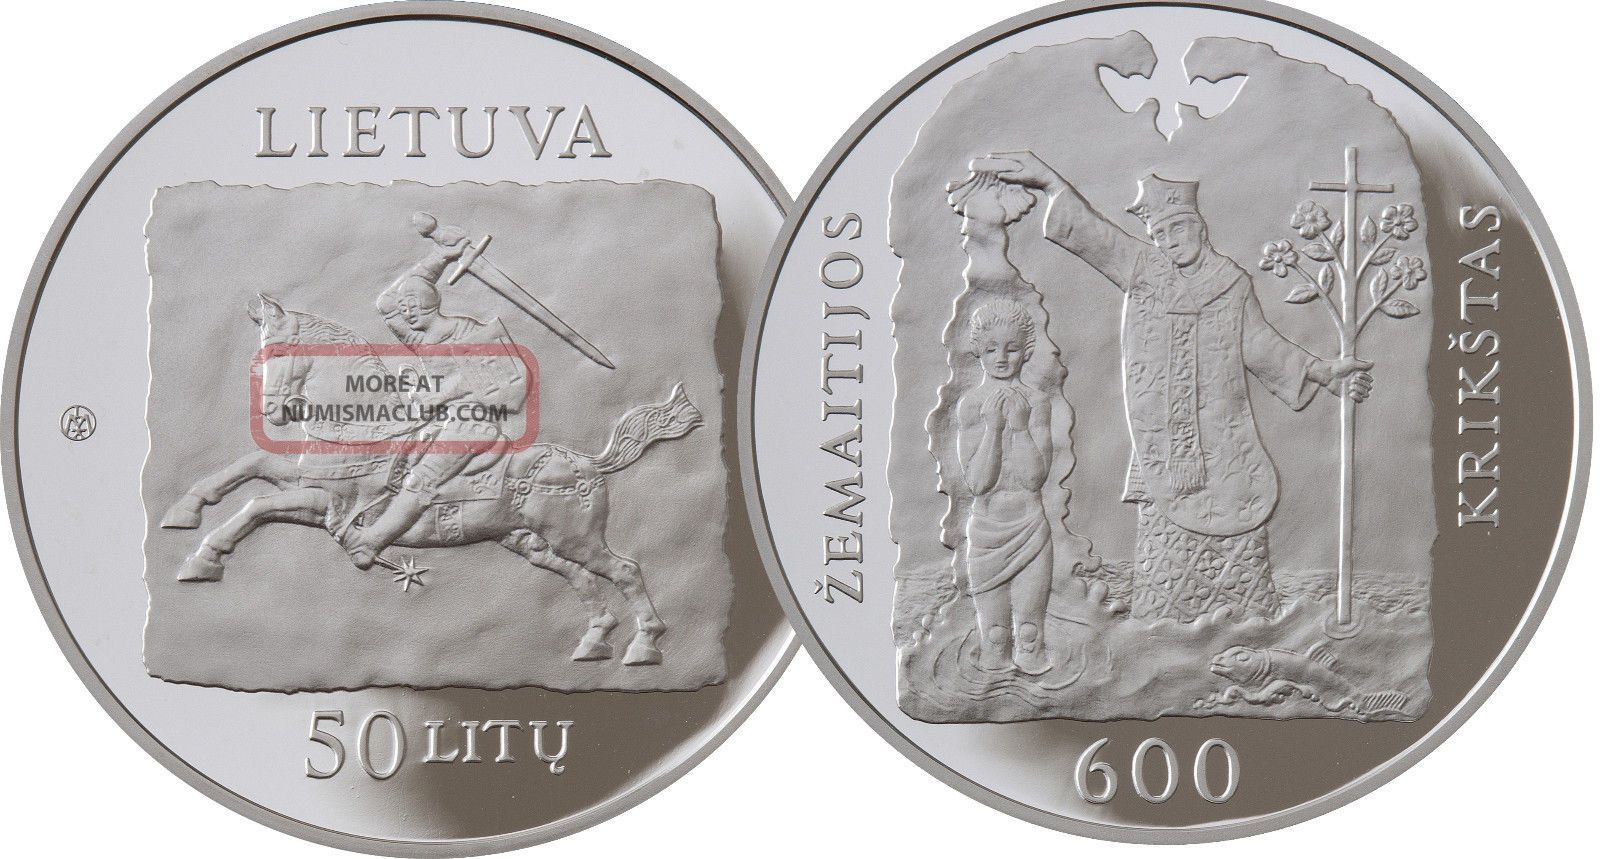 Lithuania Silver Coin 50 Litu Proof 2013 Christening Of Samogitia Km 194 Europe photo